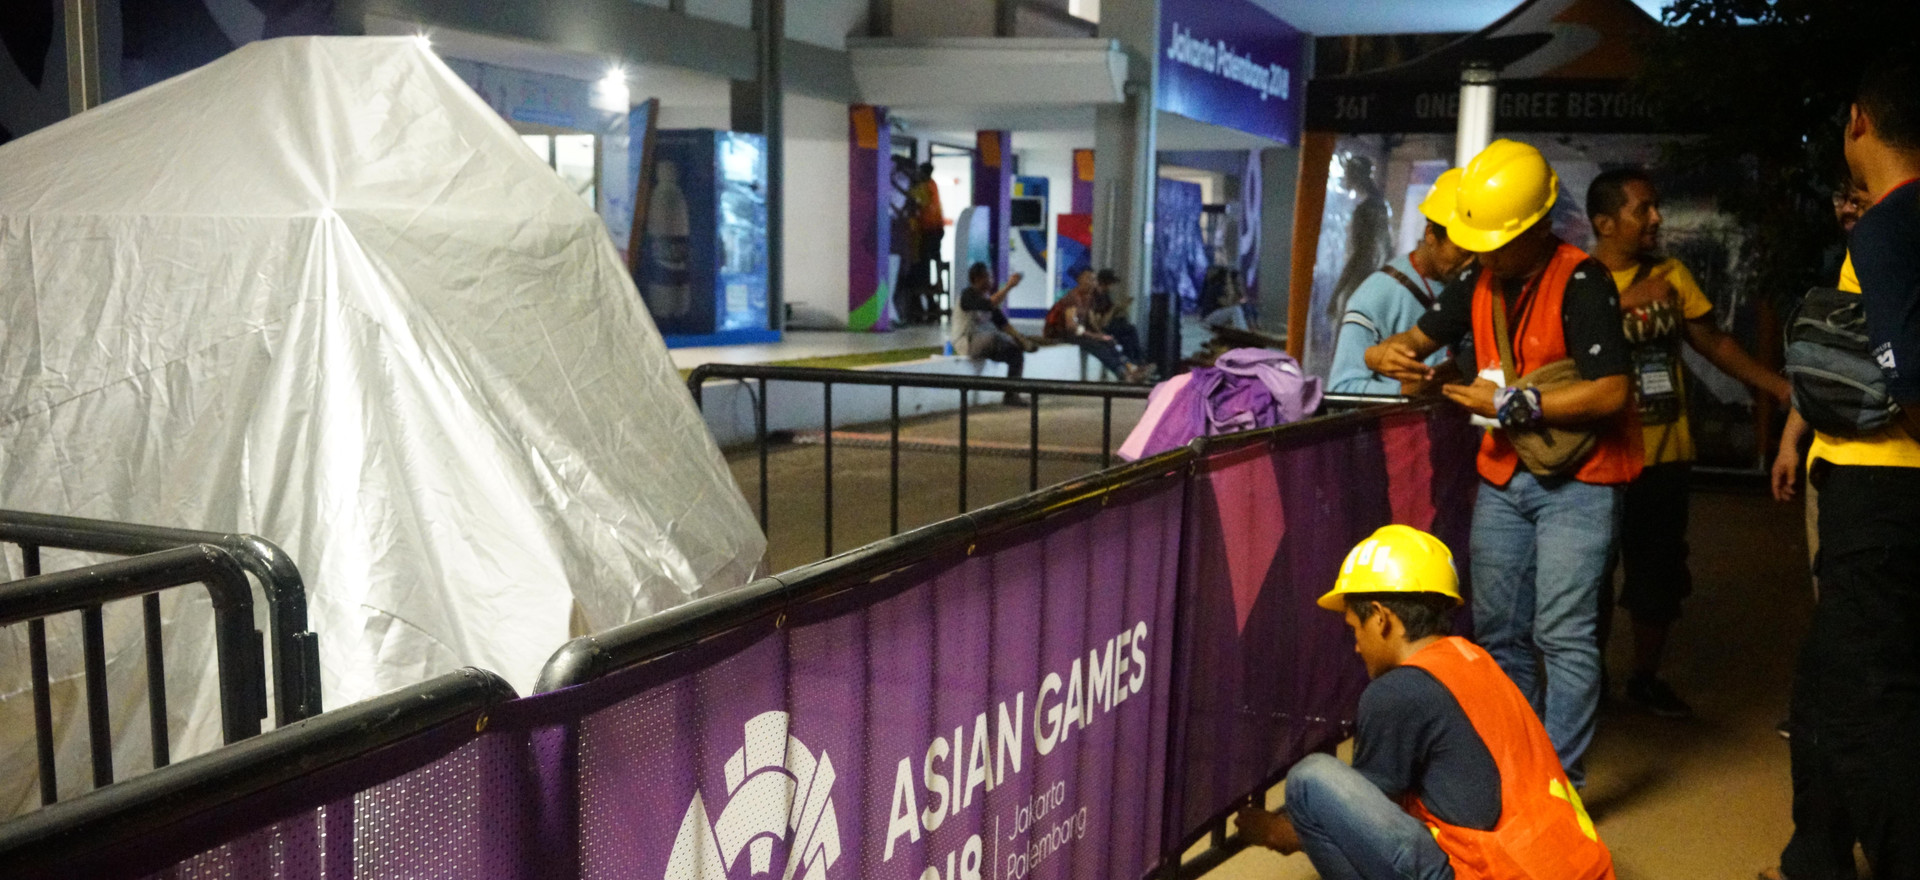 Asian Games 2018 - GBK Beautification - Entrance Door